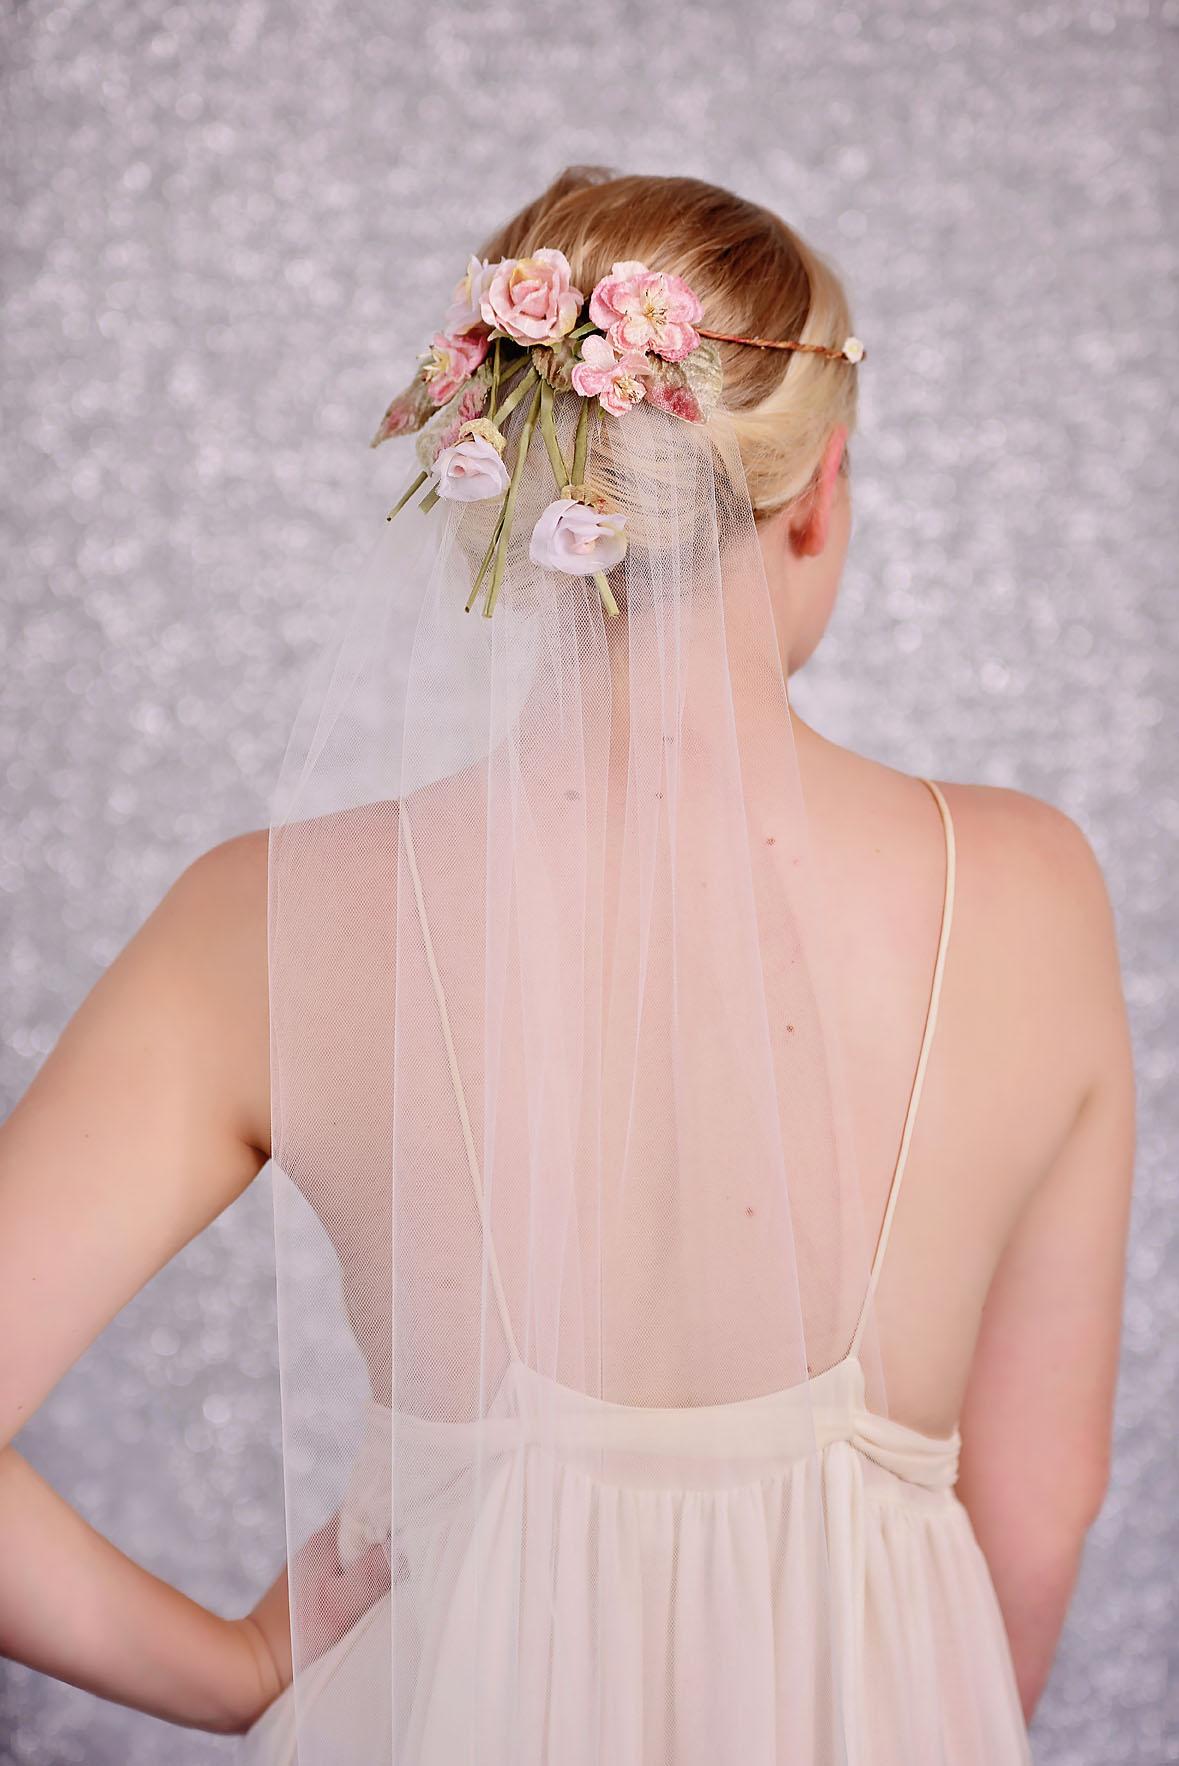 Wedding Veil With Pink Flower Crown